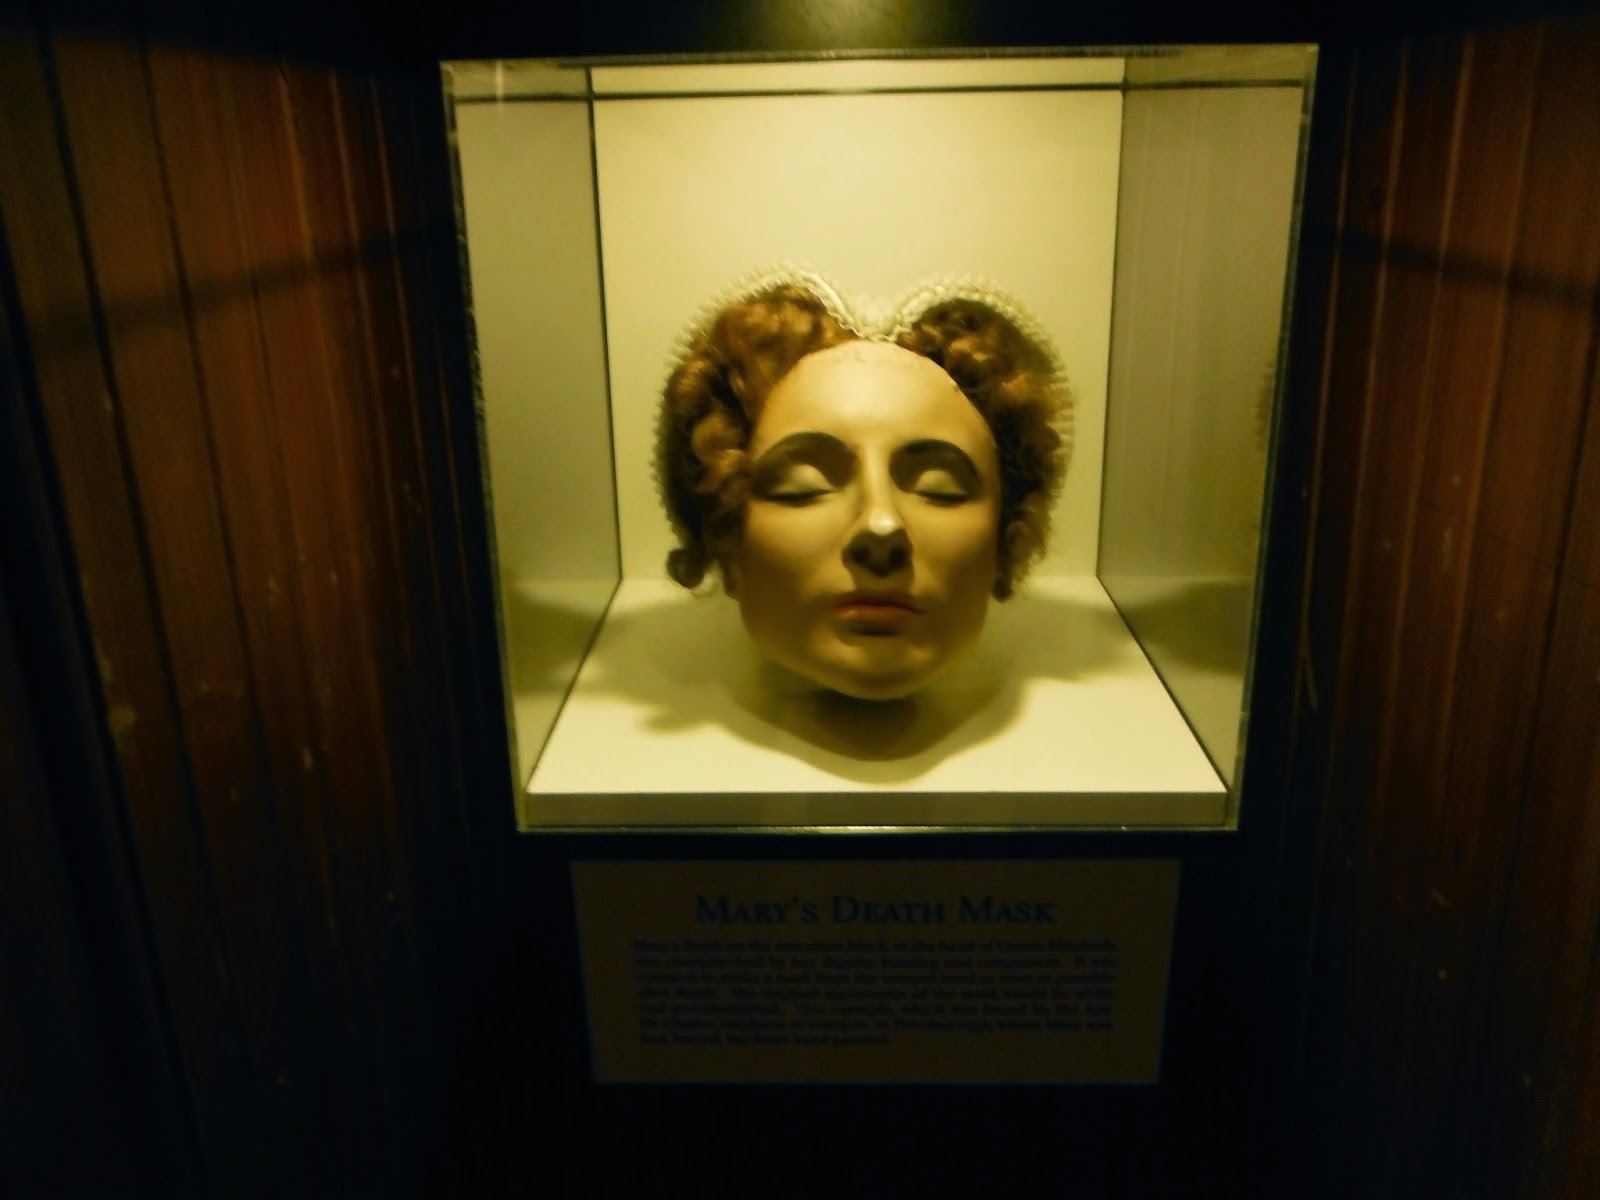 Anne Boleyn Death Mask Images - Reverse Search